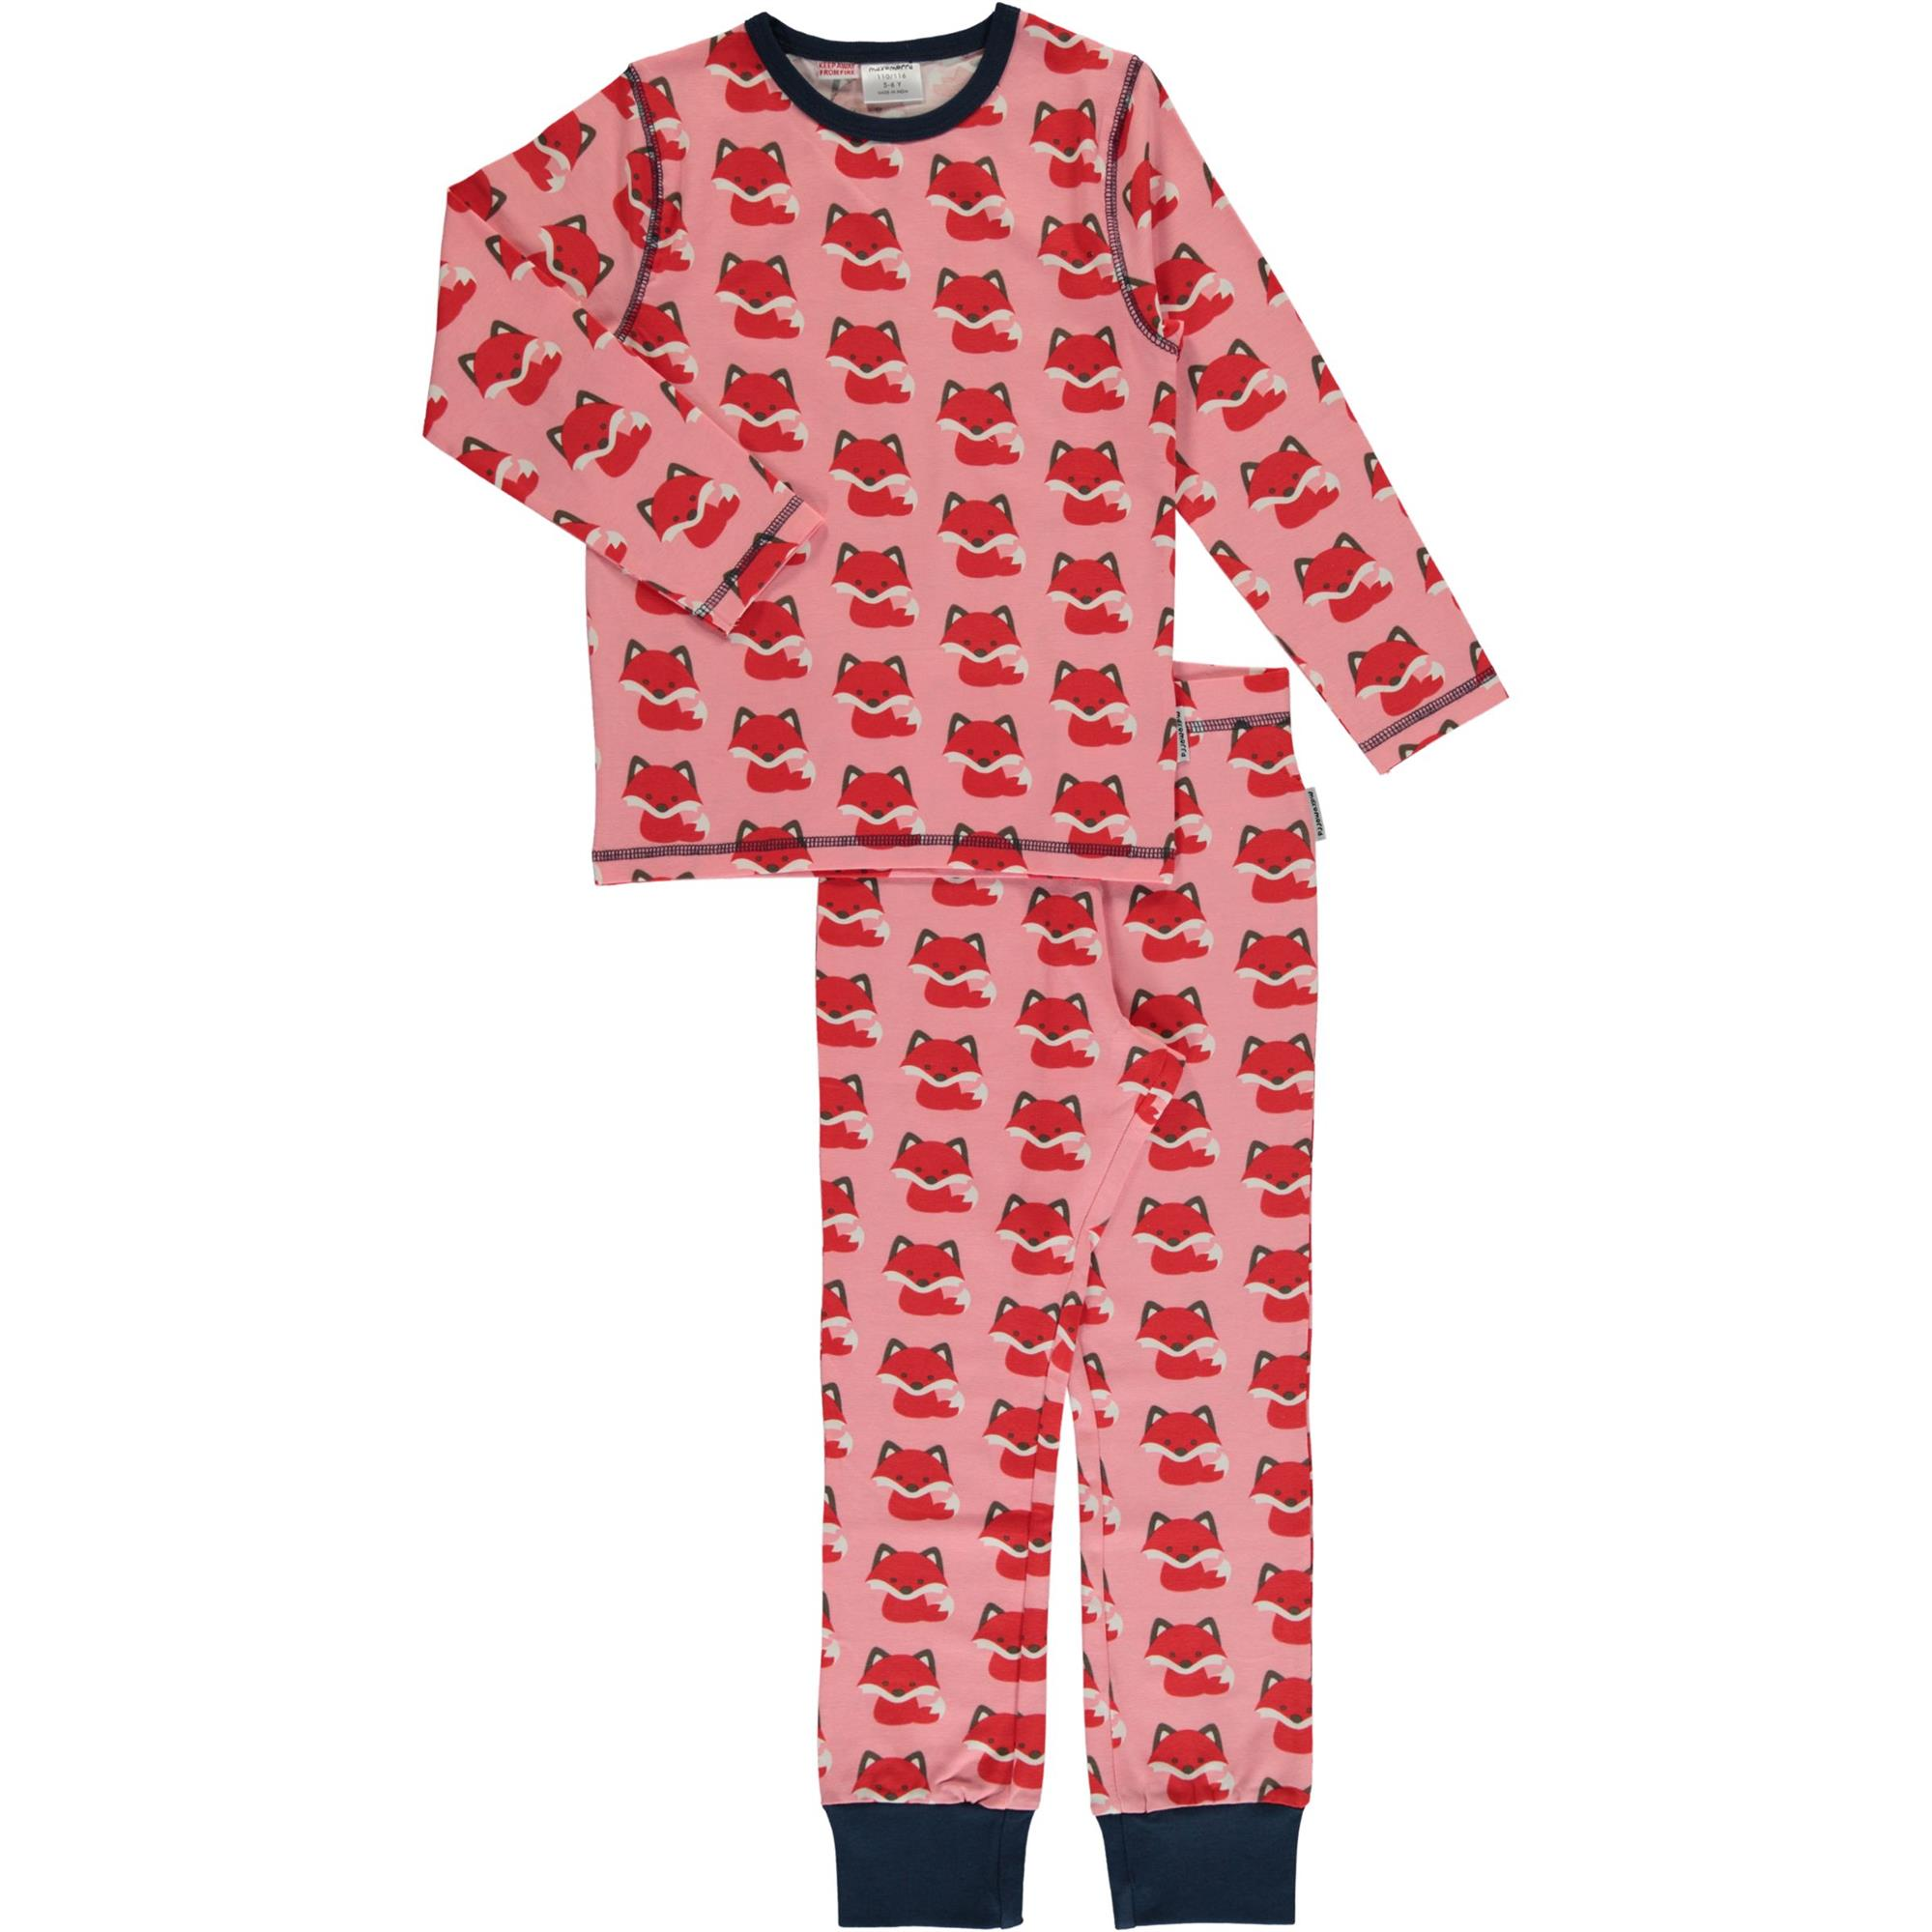 Baby & Toddler Clothing Hatley Fair Isle Fawn Organic Cotton Baby Pyjamas Girls' Clothing (newborn-5t)